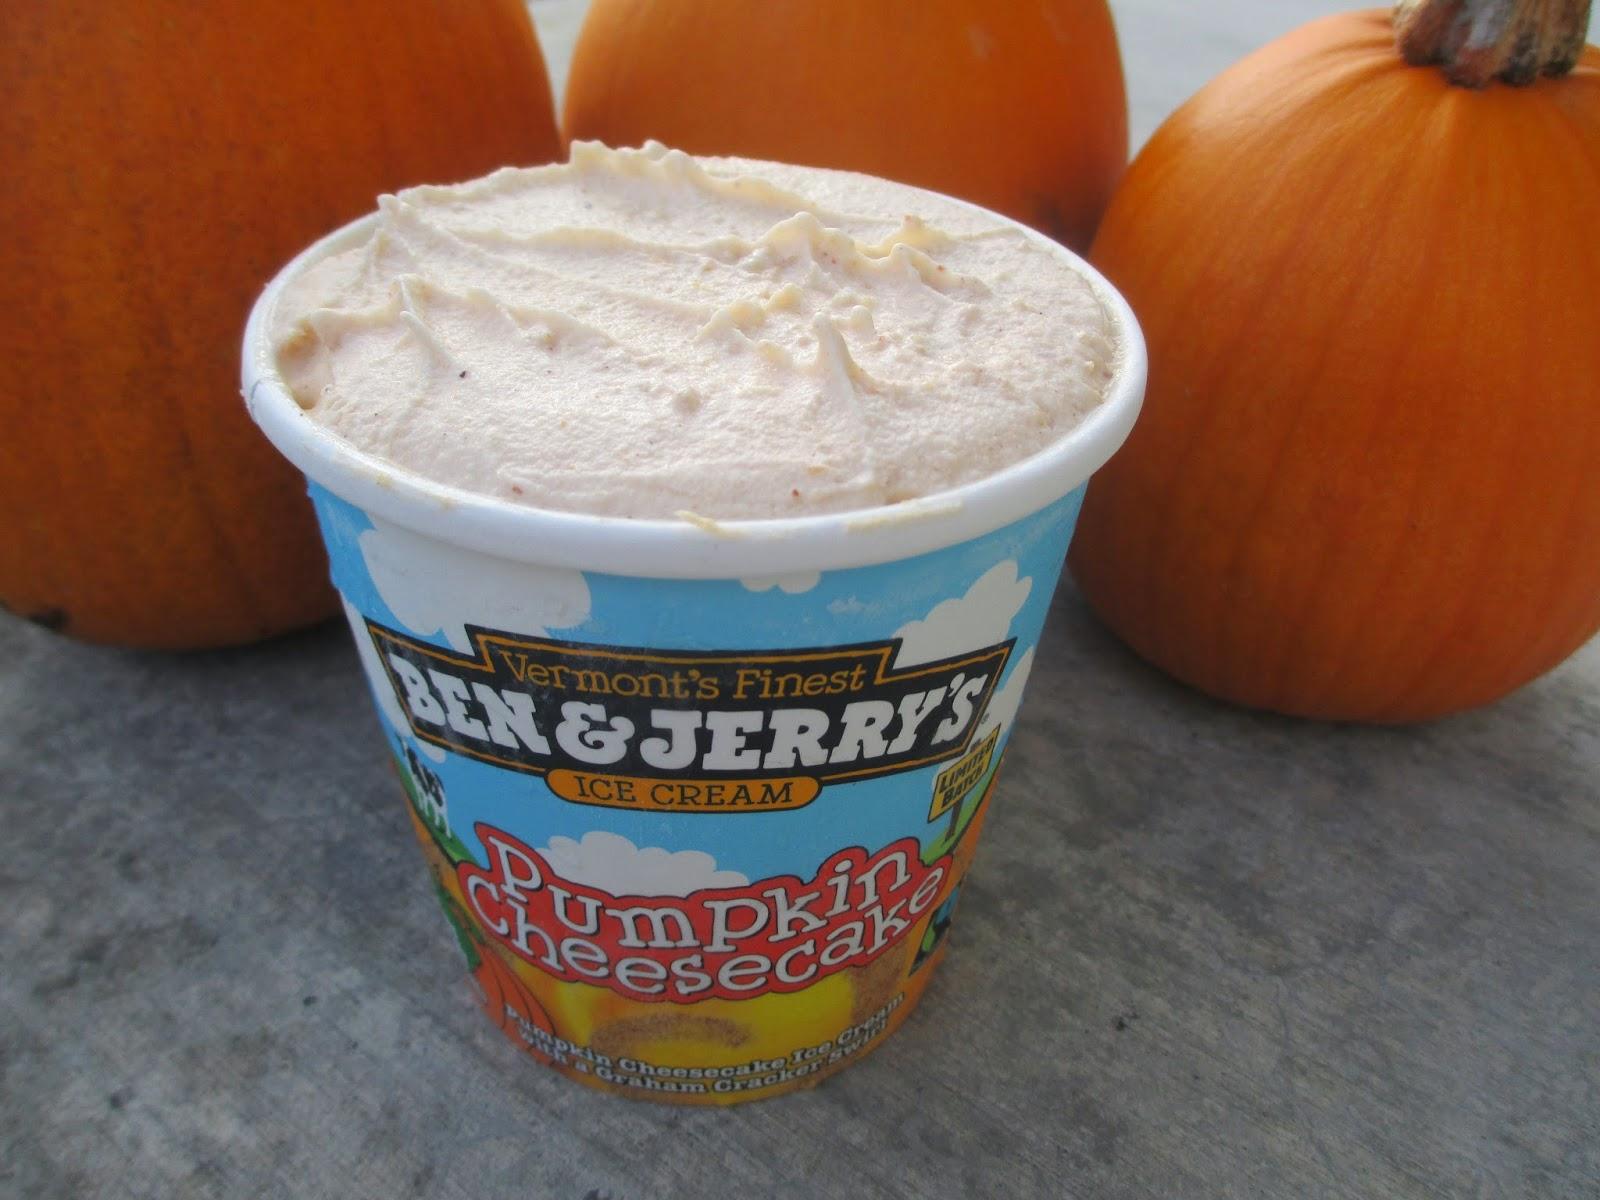 Pumpkin Cheesecake Ice Cream and Homegrown Pumpkins